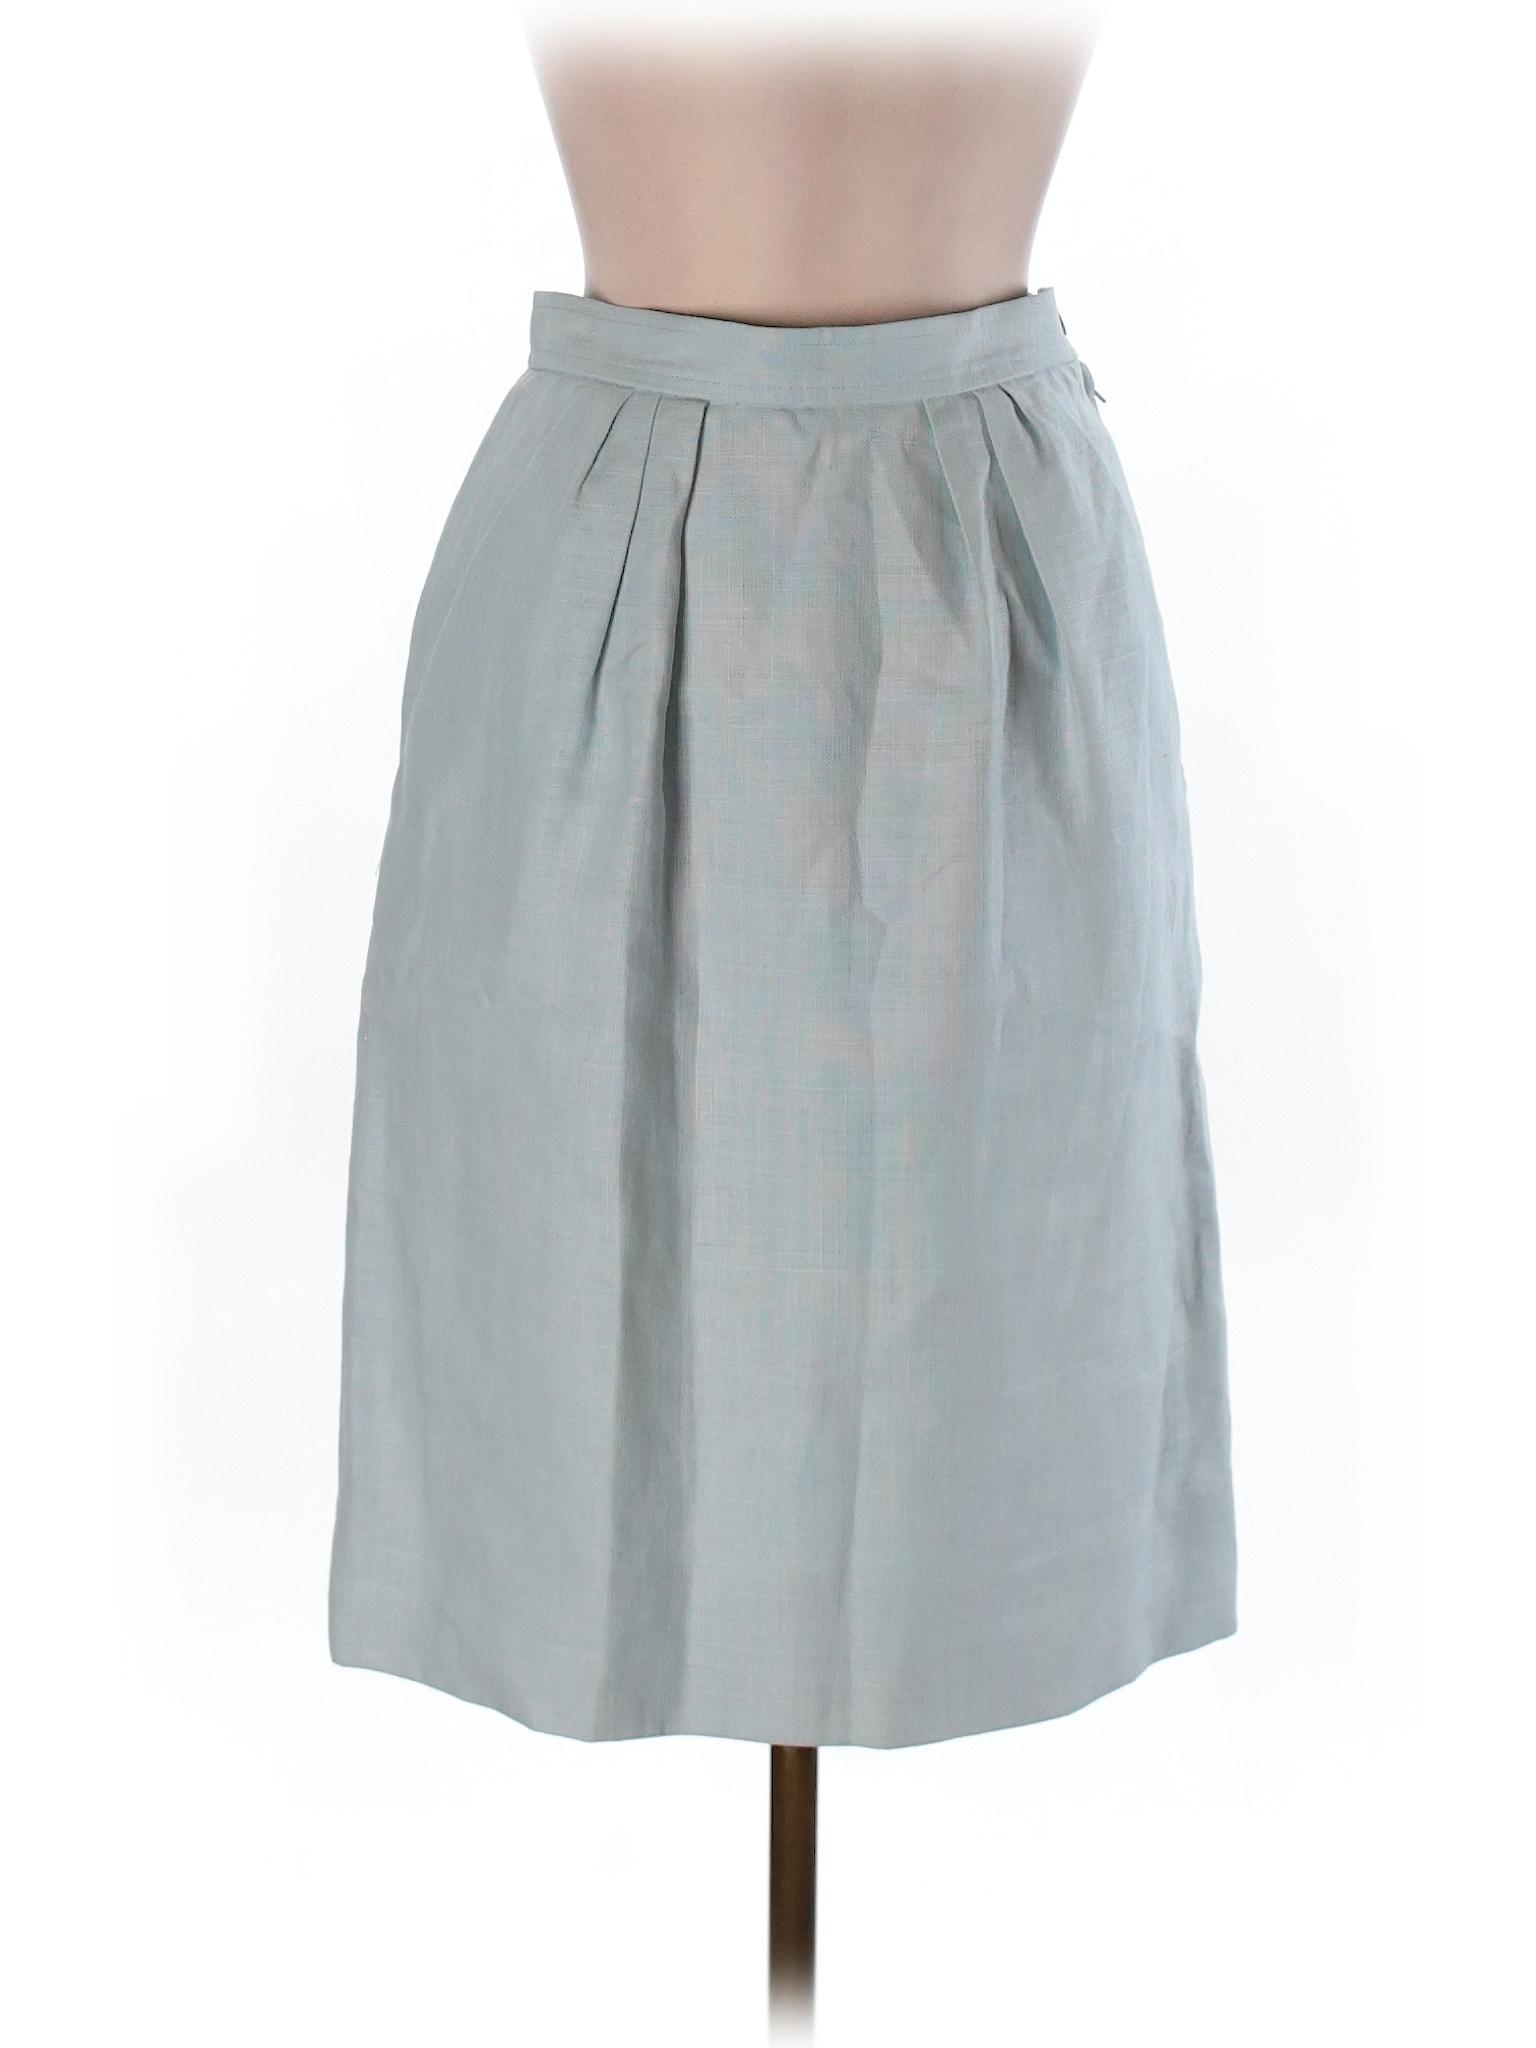 Yves saint laurent rive gauche casual skirt 80 off only for Bureau yves saint laurent